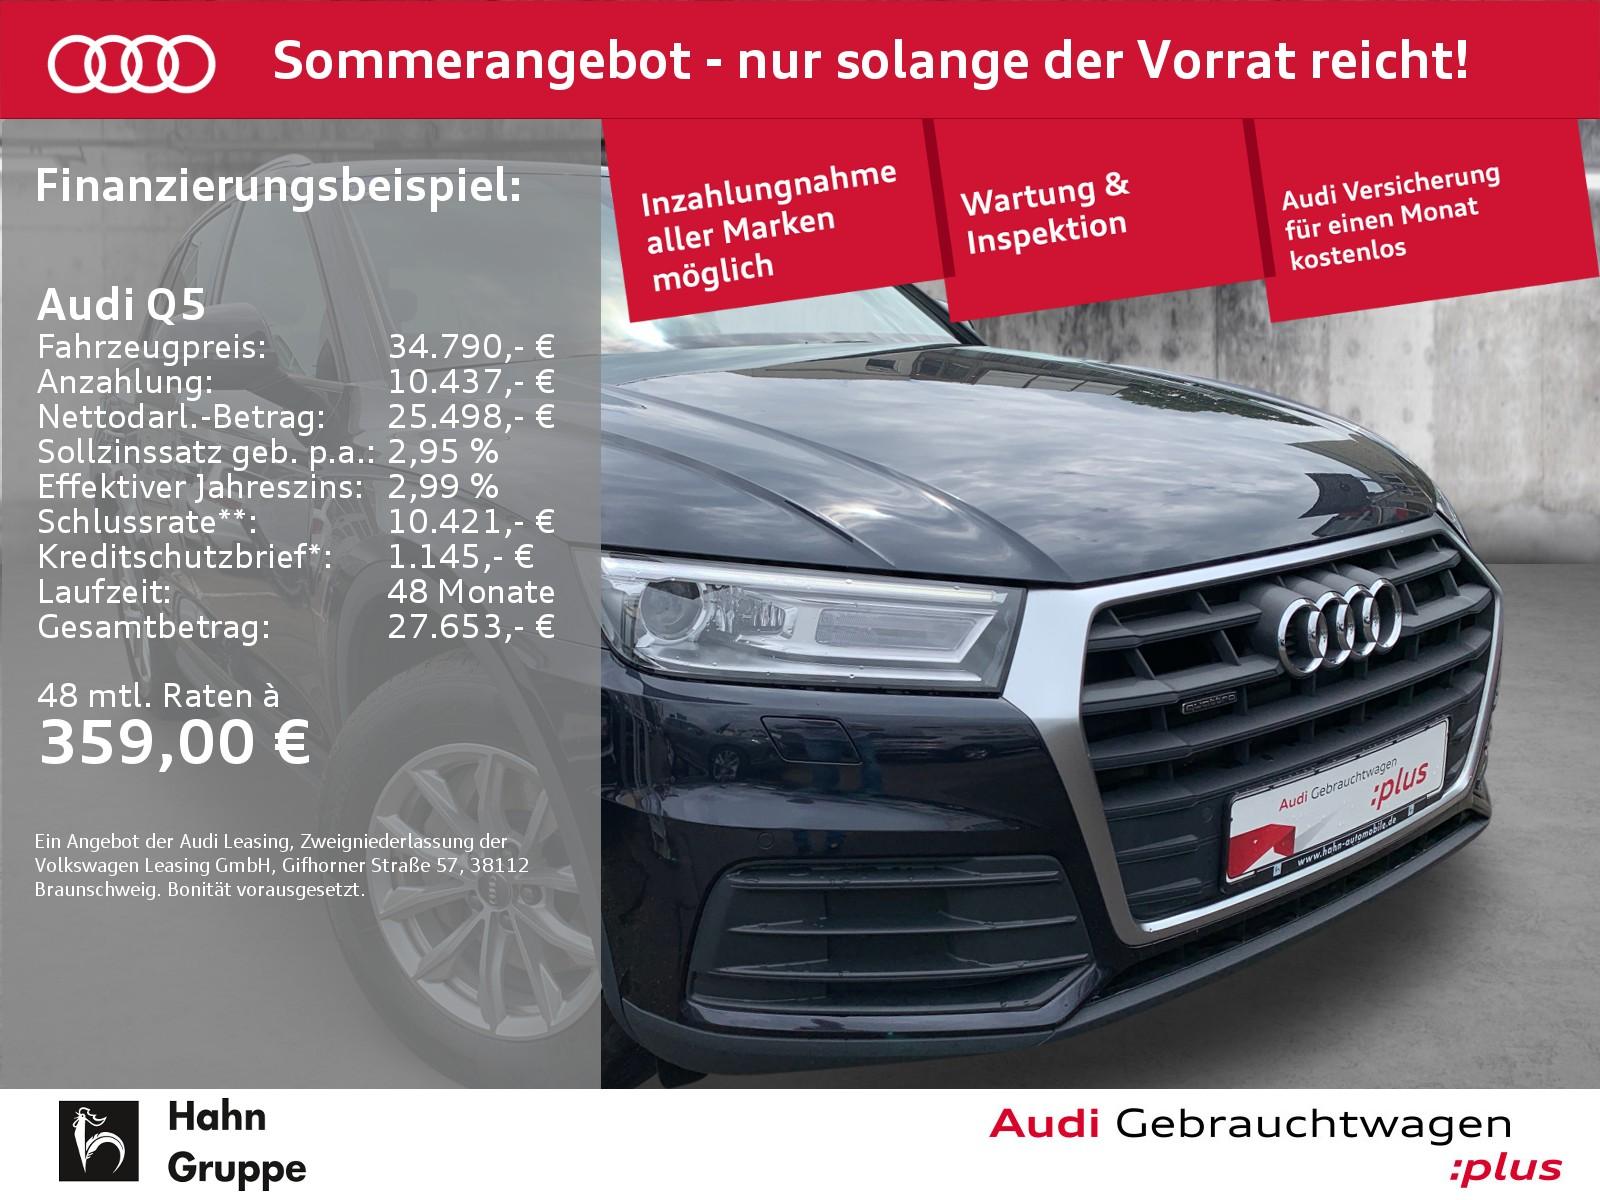 Audi Q5 2.0 TFSI qua. S-trc Navi Xen AHK CAM Pano, Jahr 2018, Benzin